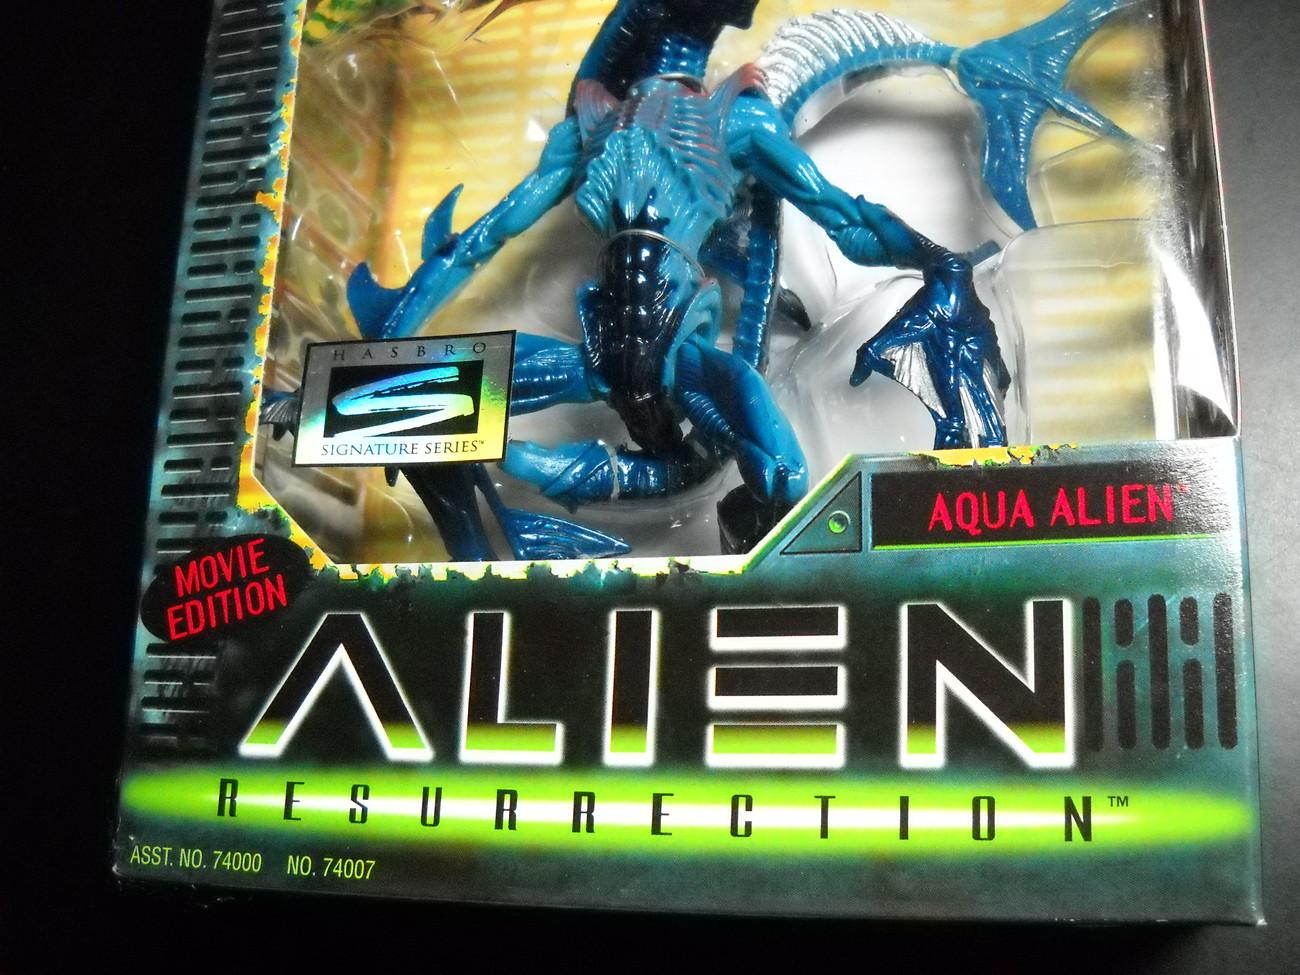 Kenner Hasbro Aliens Alien Resurrection Aqua Alien 1997 MIB Factory Sealed Box